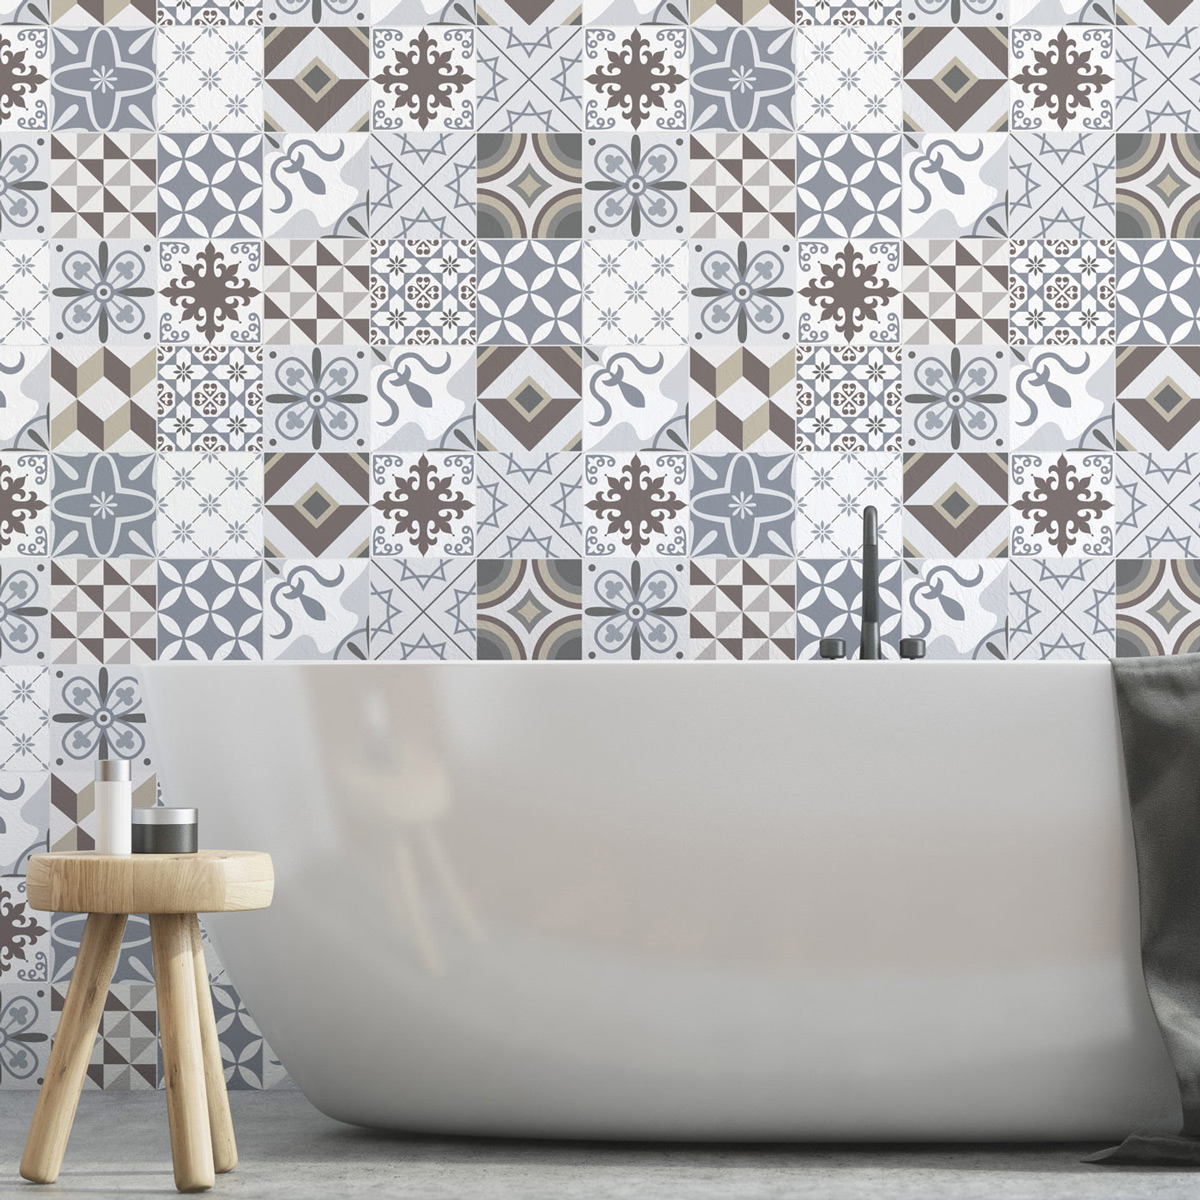 24 stickers carrelages azulejos ornements d licats art. Black Bedroom Furniture Sets. Home Design Ideas